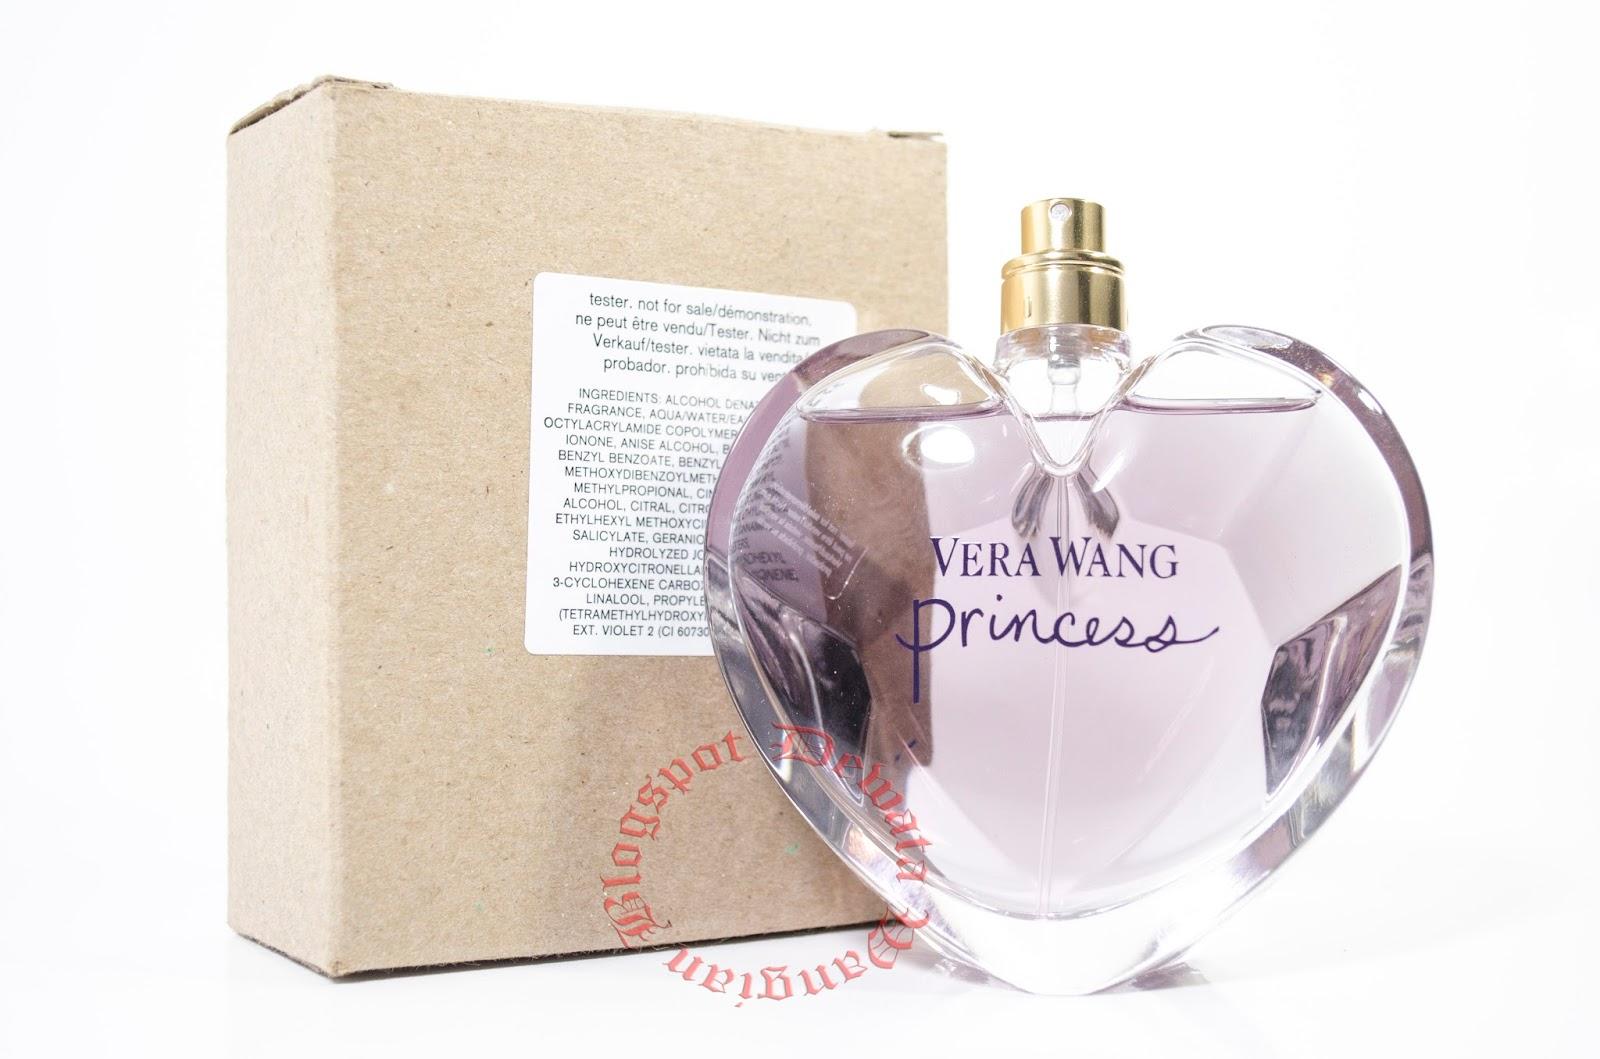 Vera Wang Princess Tester Perfume